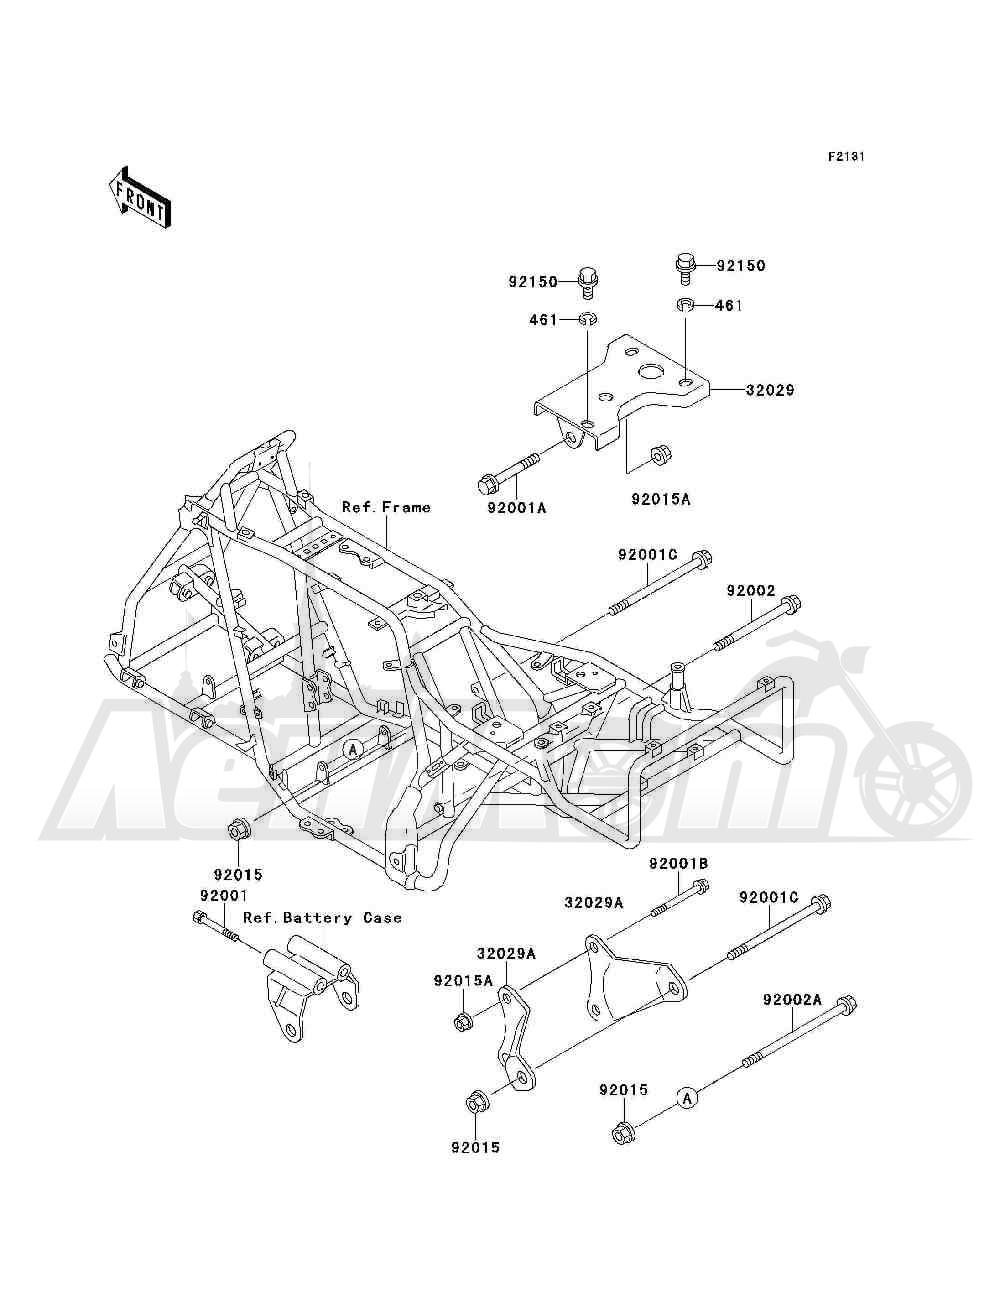 Запчасти для Квадроцикла Kawasaki 1994 BAYOU 300 4X4 (KLF300-C6) Раздел: FRAME FITTINGS | рама фитинги